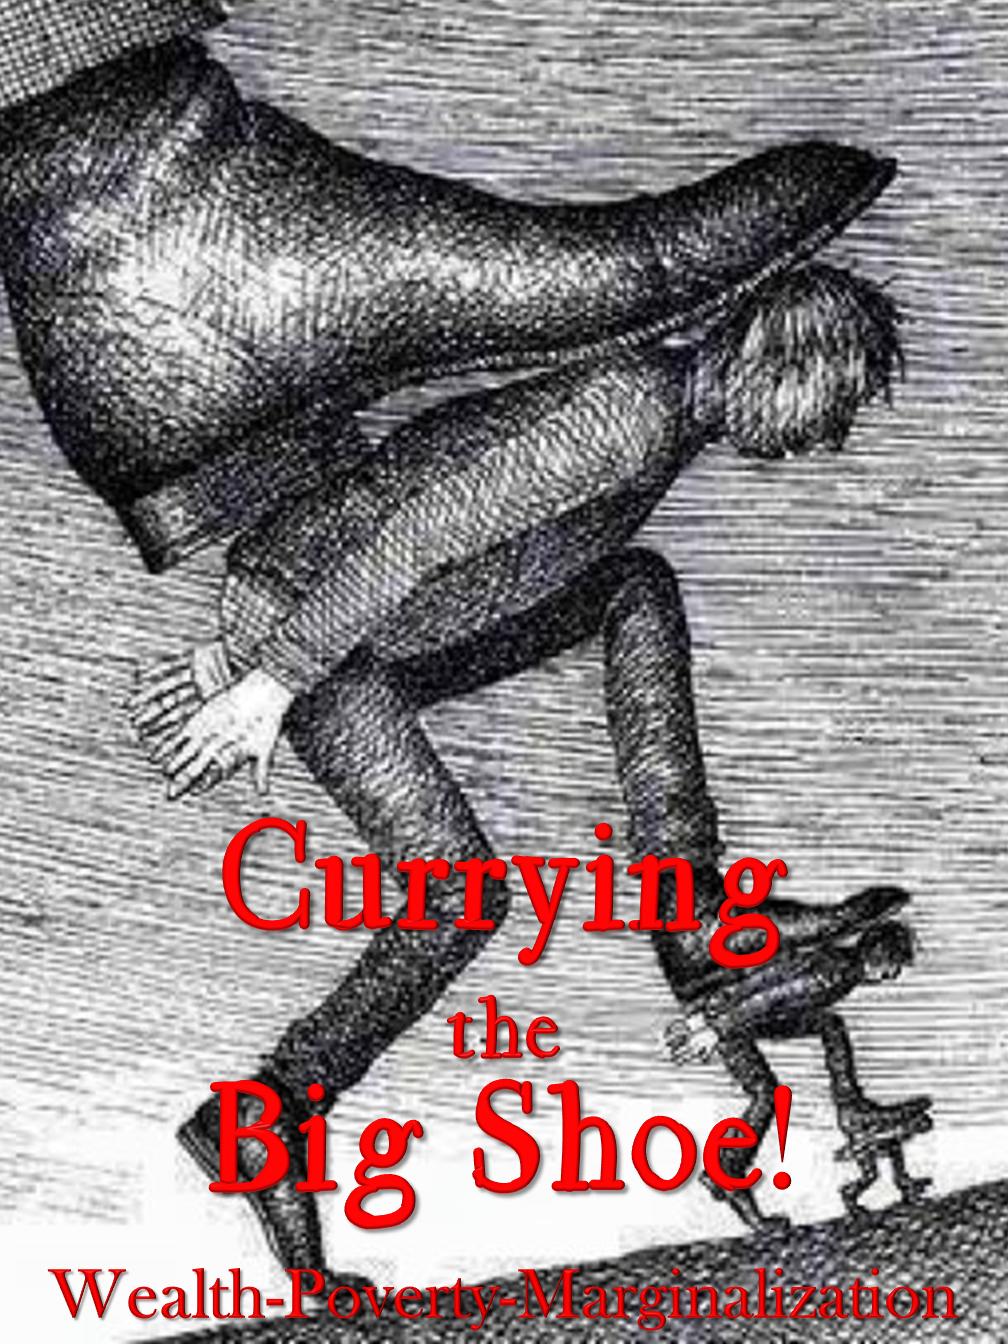 Currying the Big Shoe!